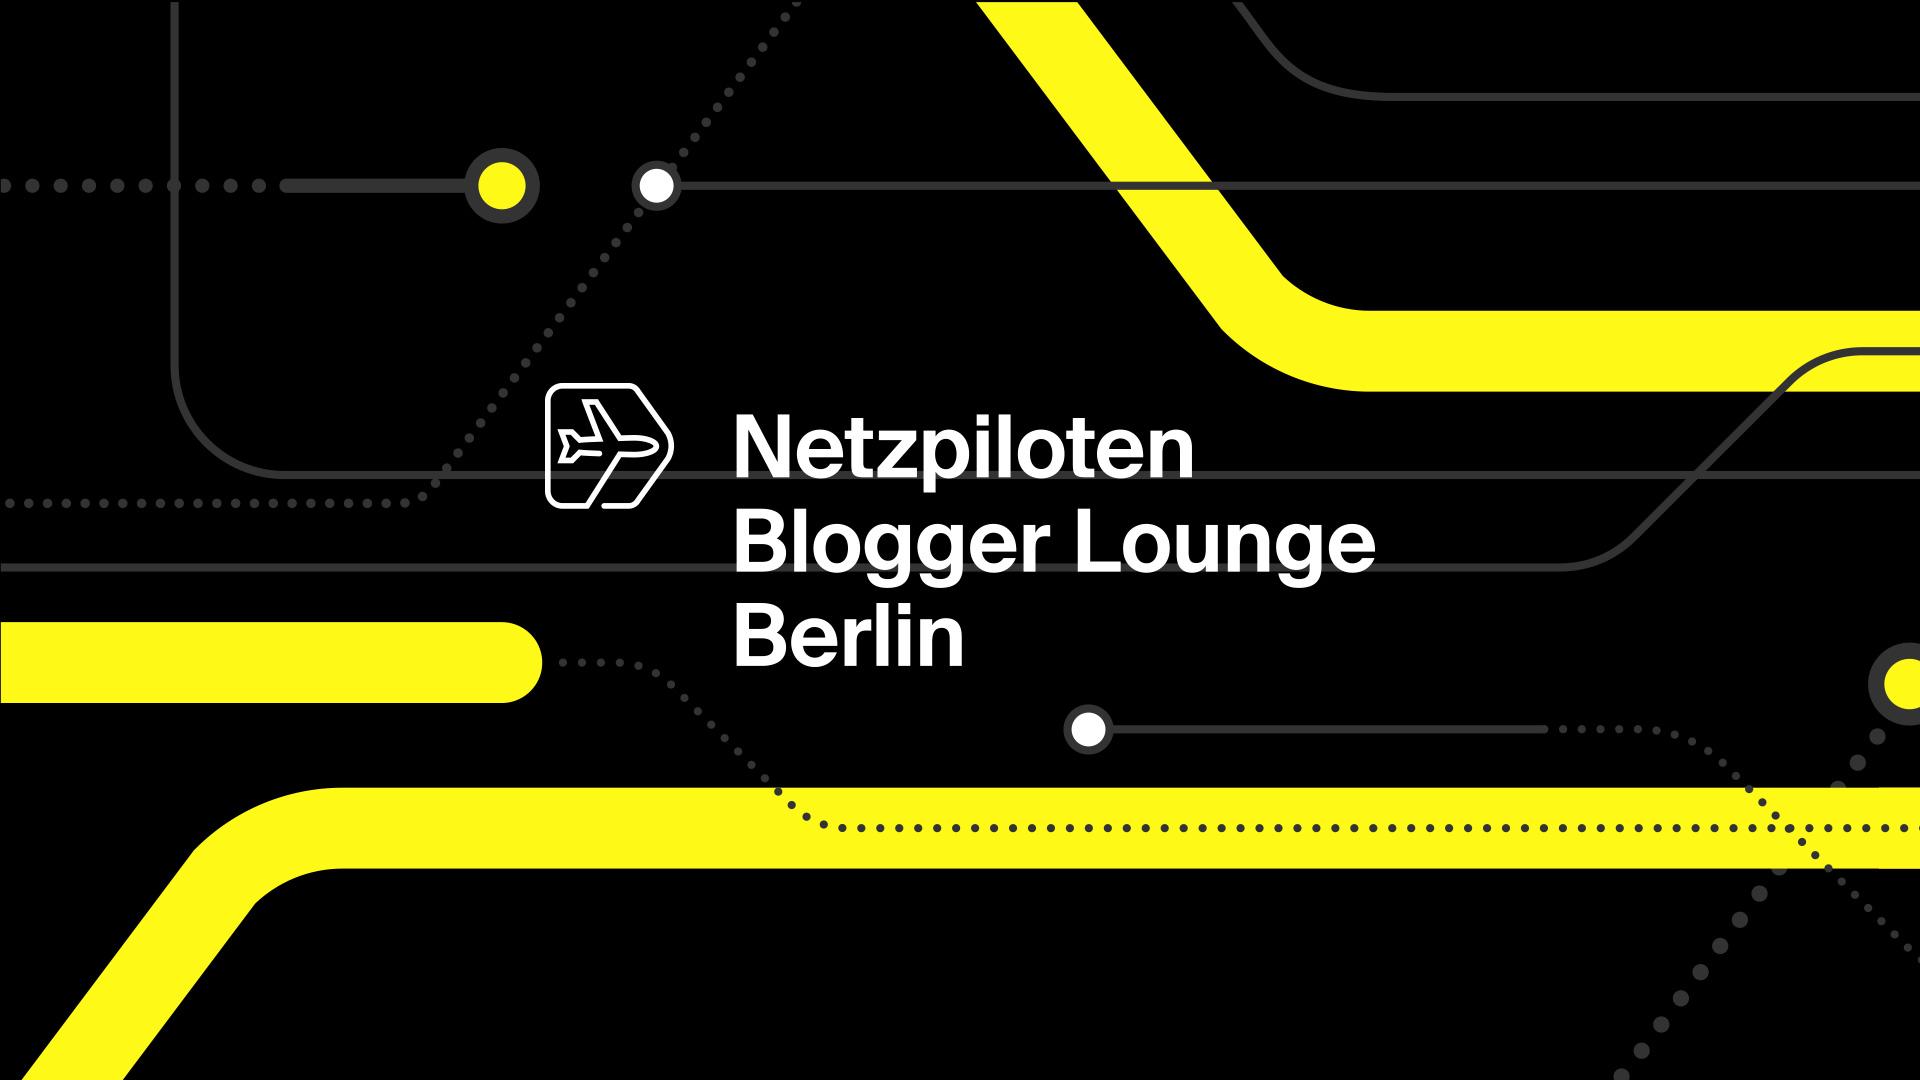 mscholz-case-netzpiloten-logo-blogger-lounge-berlin